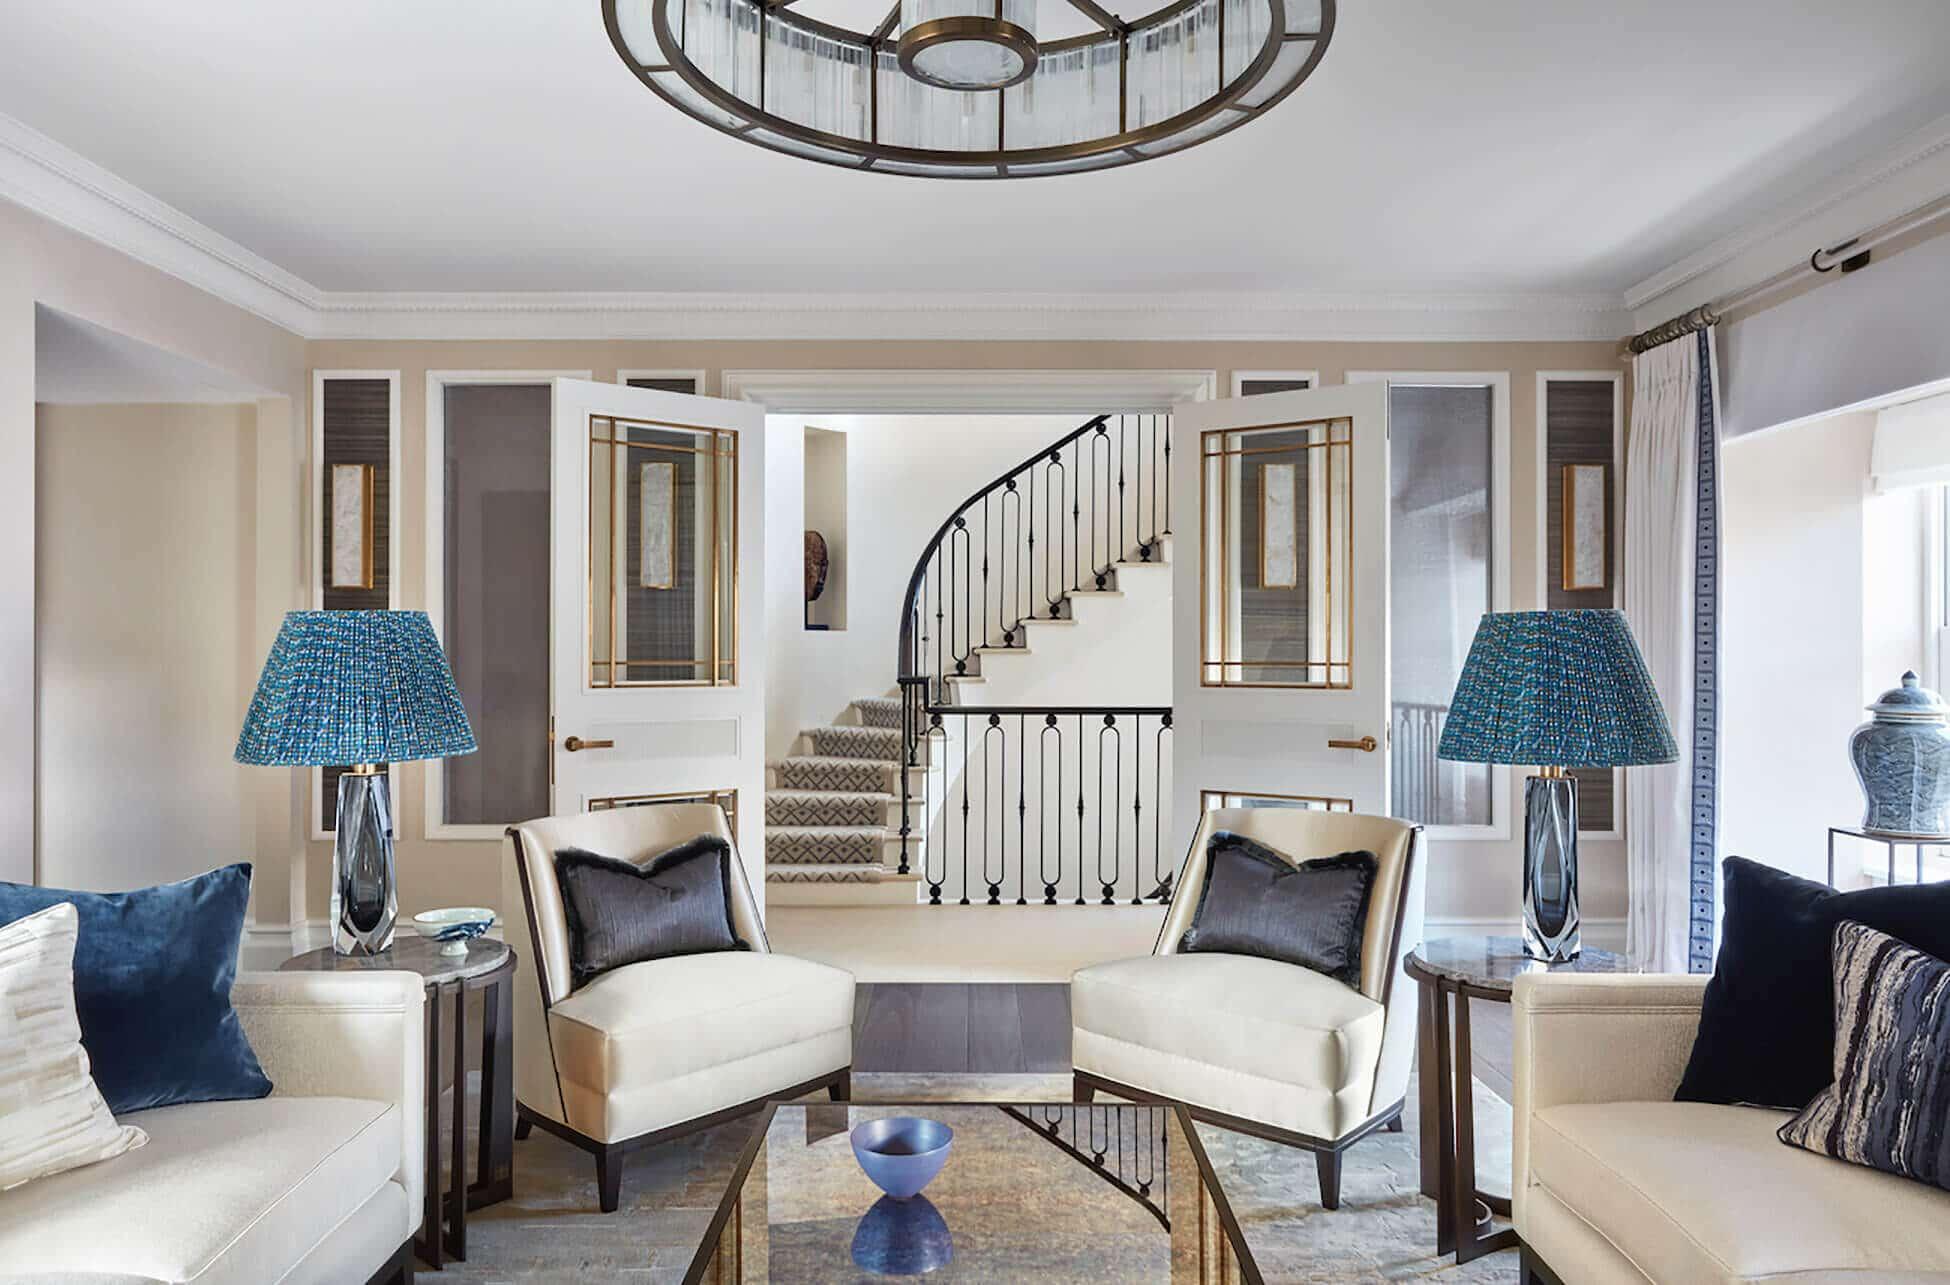 luxury interior design project in Kensington